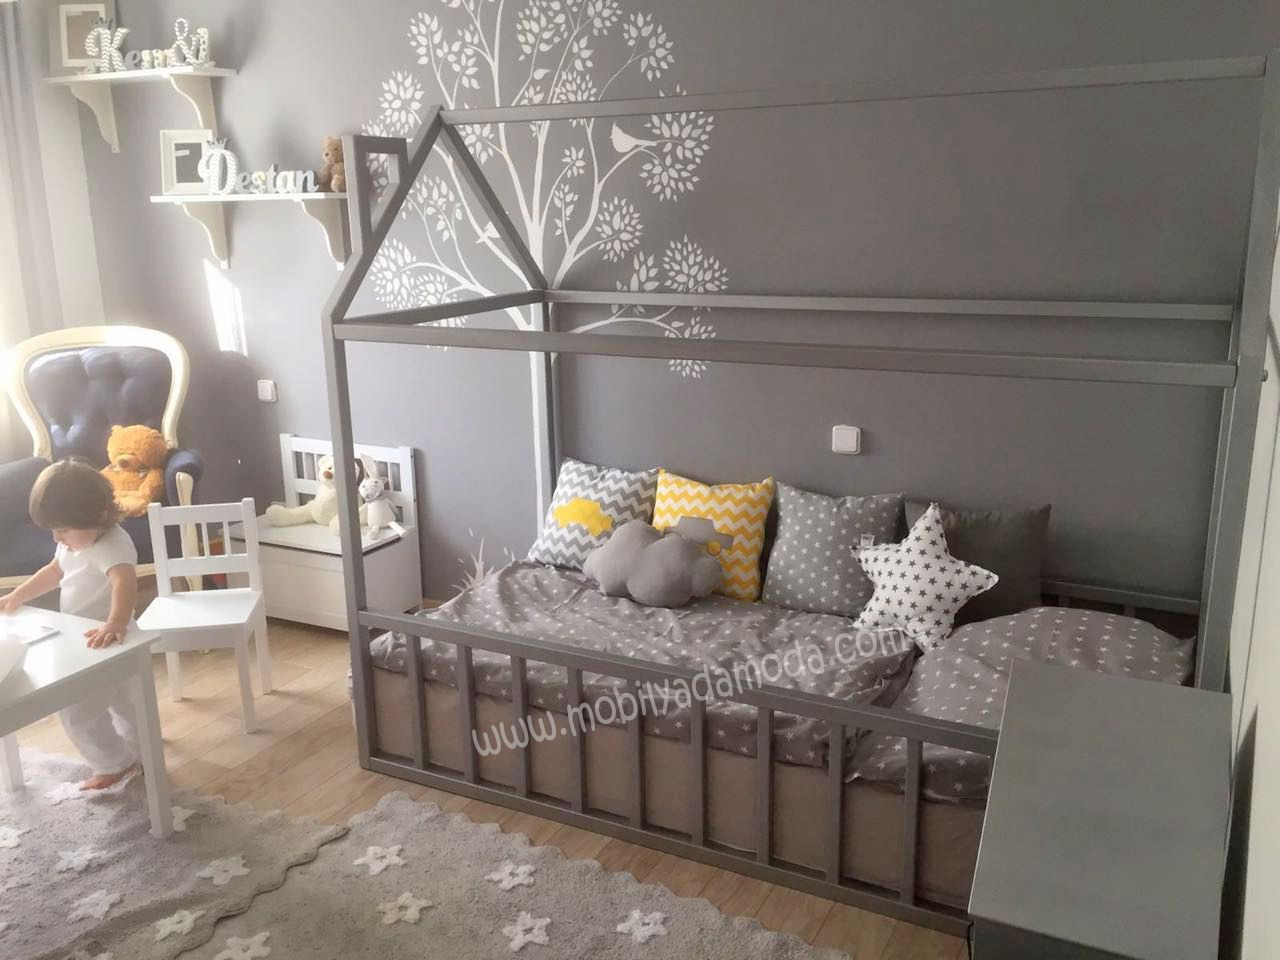 Cameretta Neonato Montessori : Montessori ev Çatılı yer yatağı bacalı colori stanze stanza di